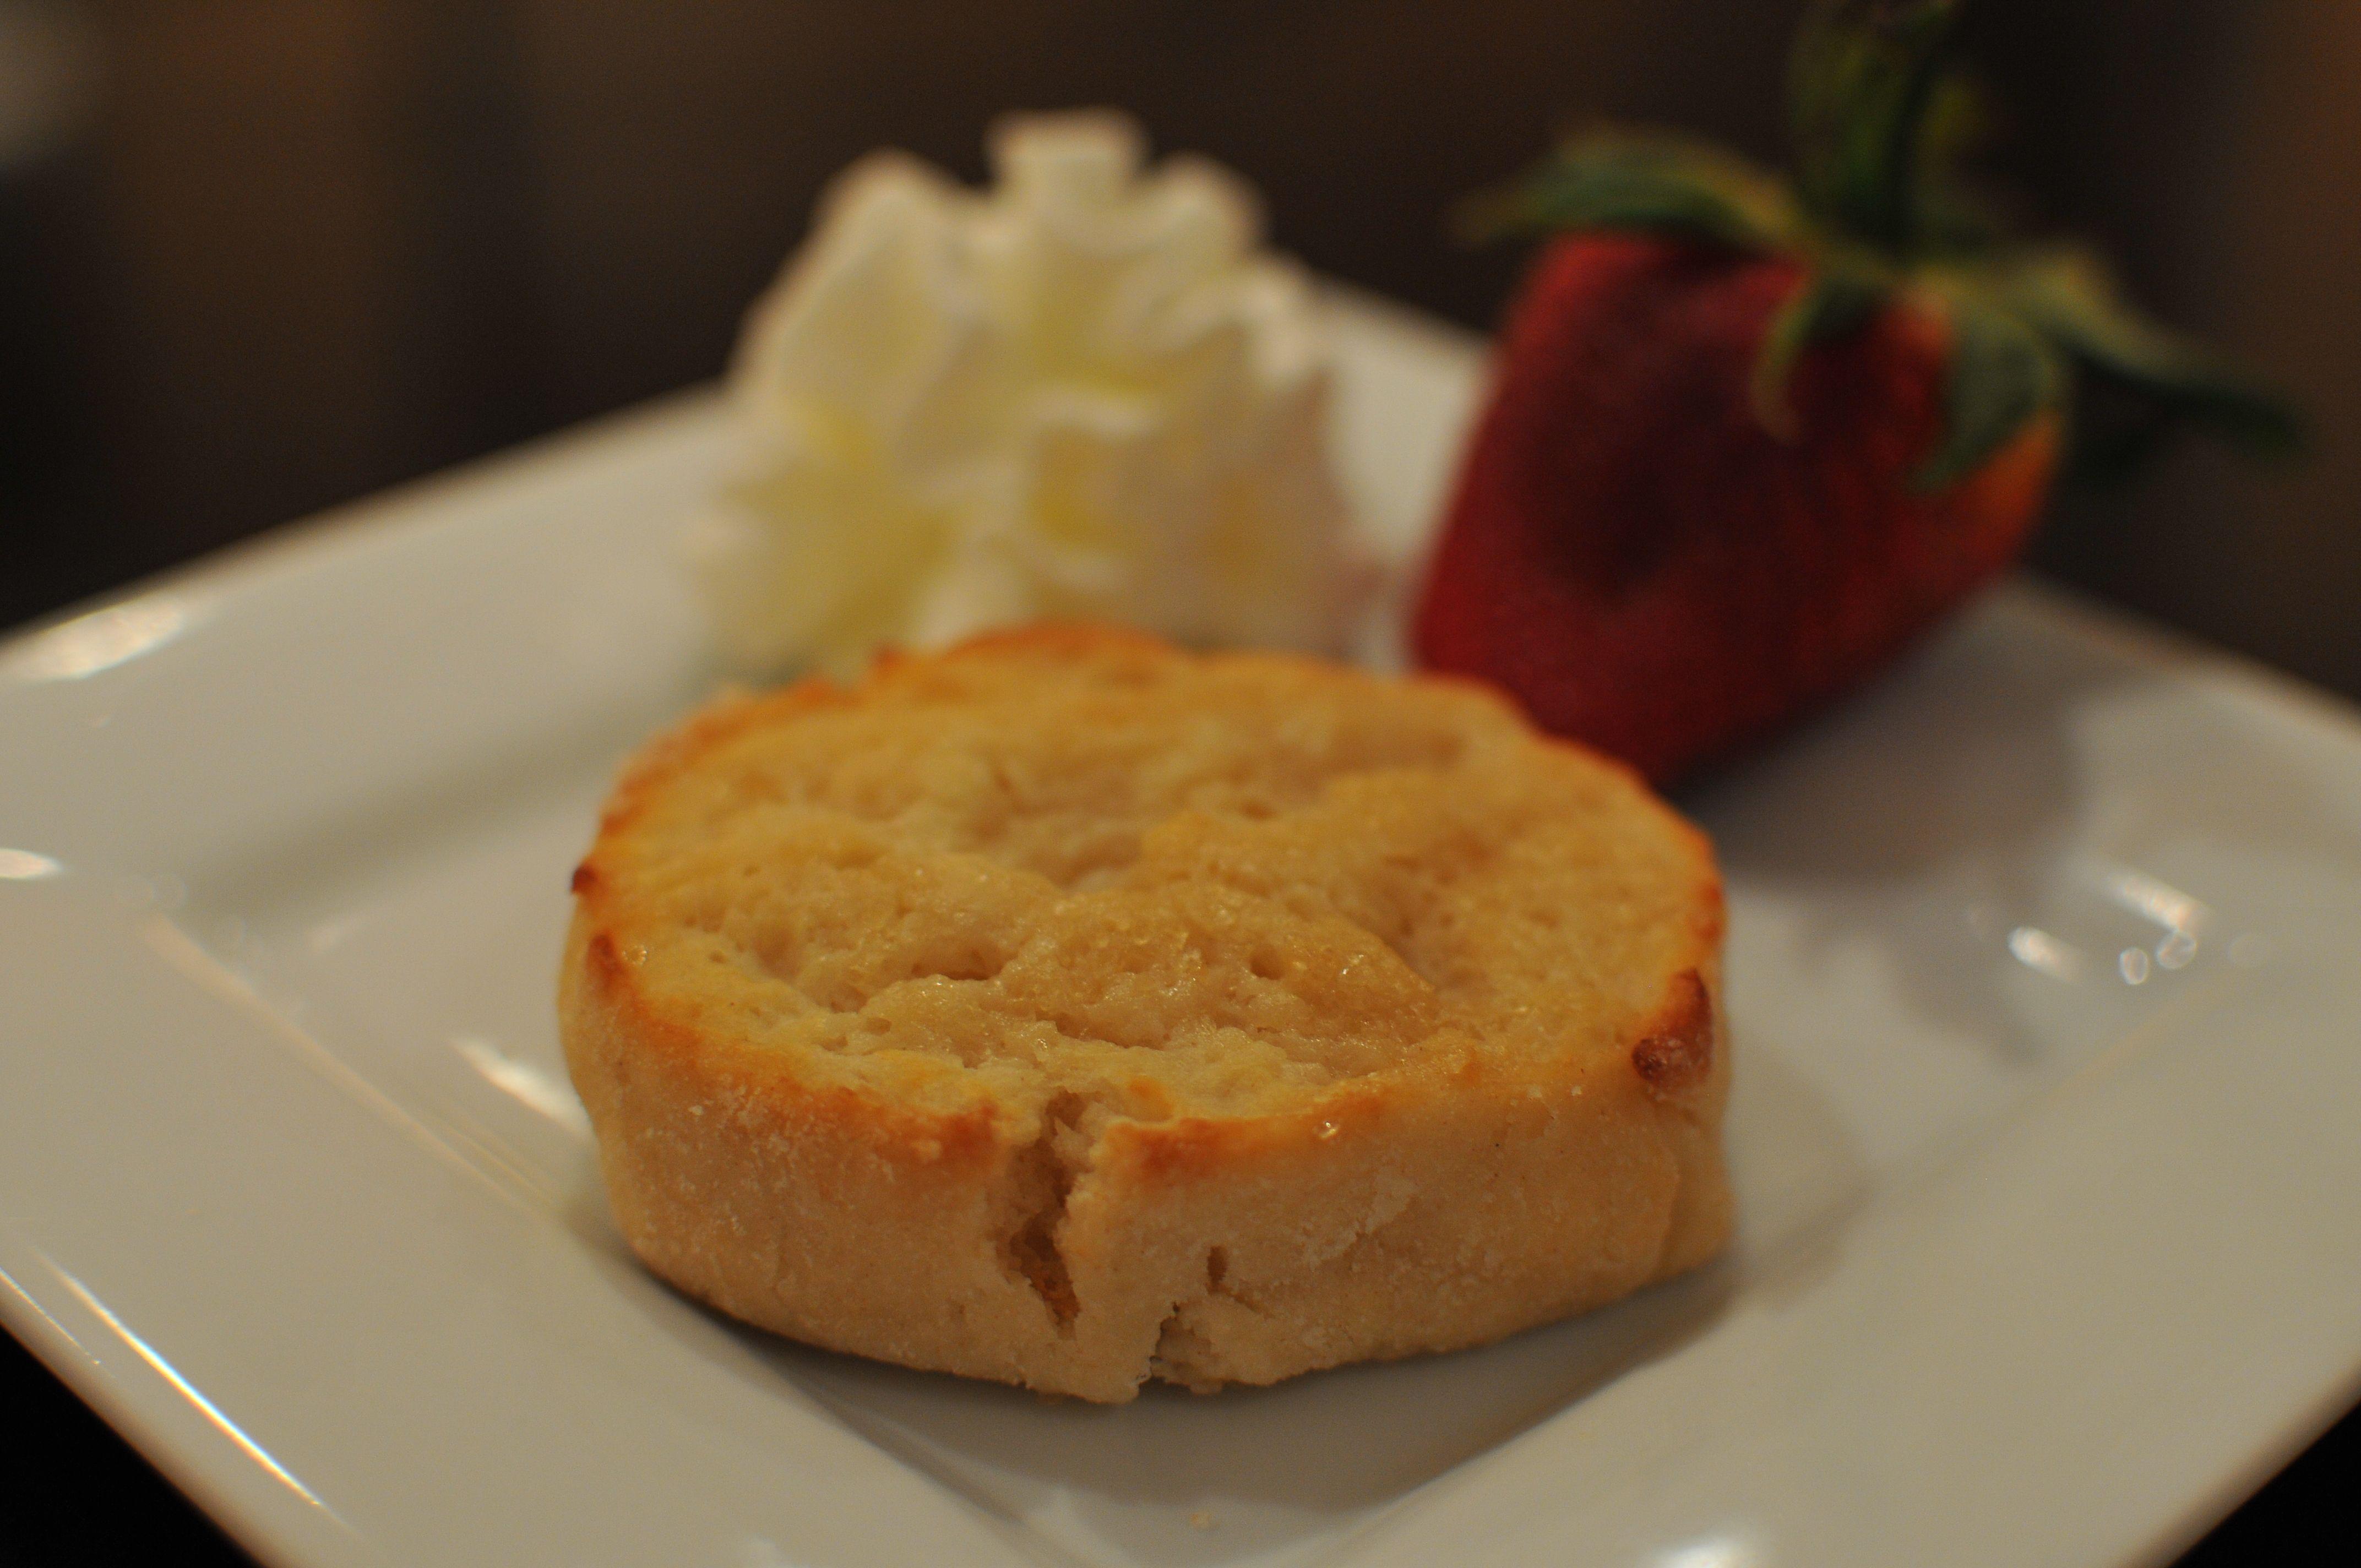 Malini S Kitchen Butter Cake